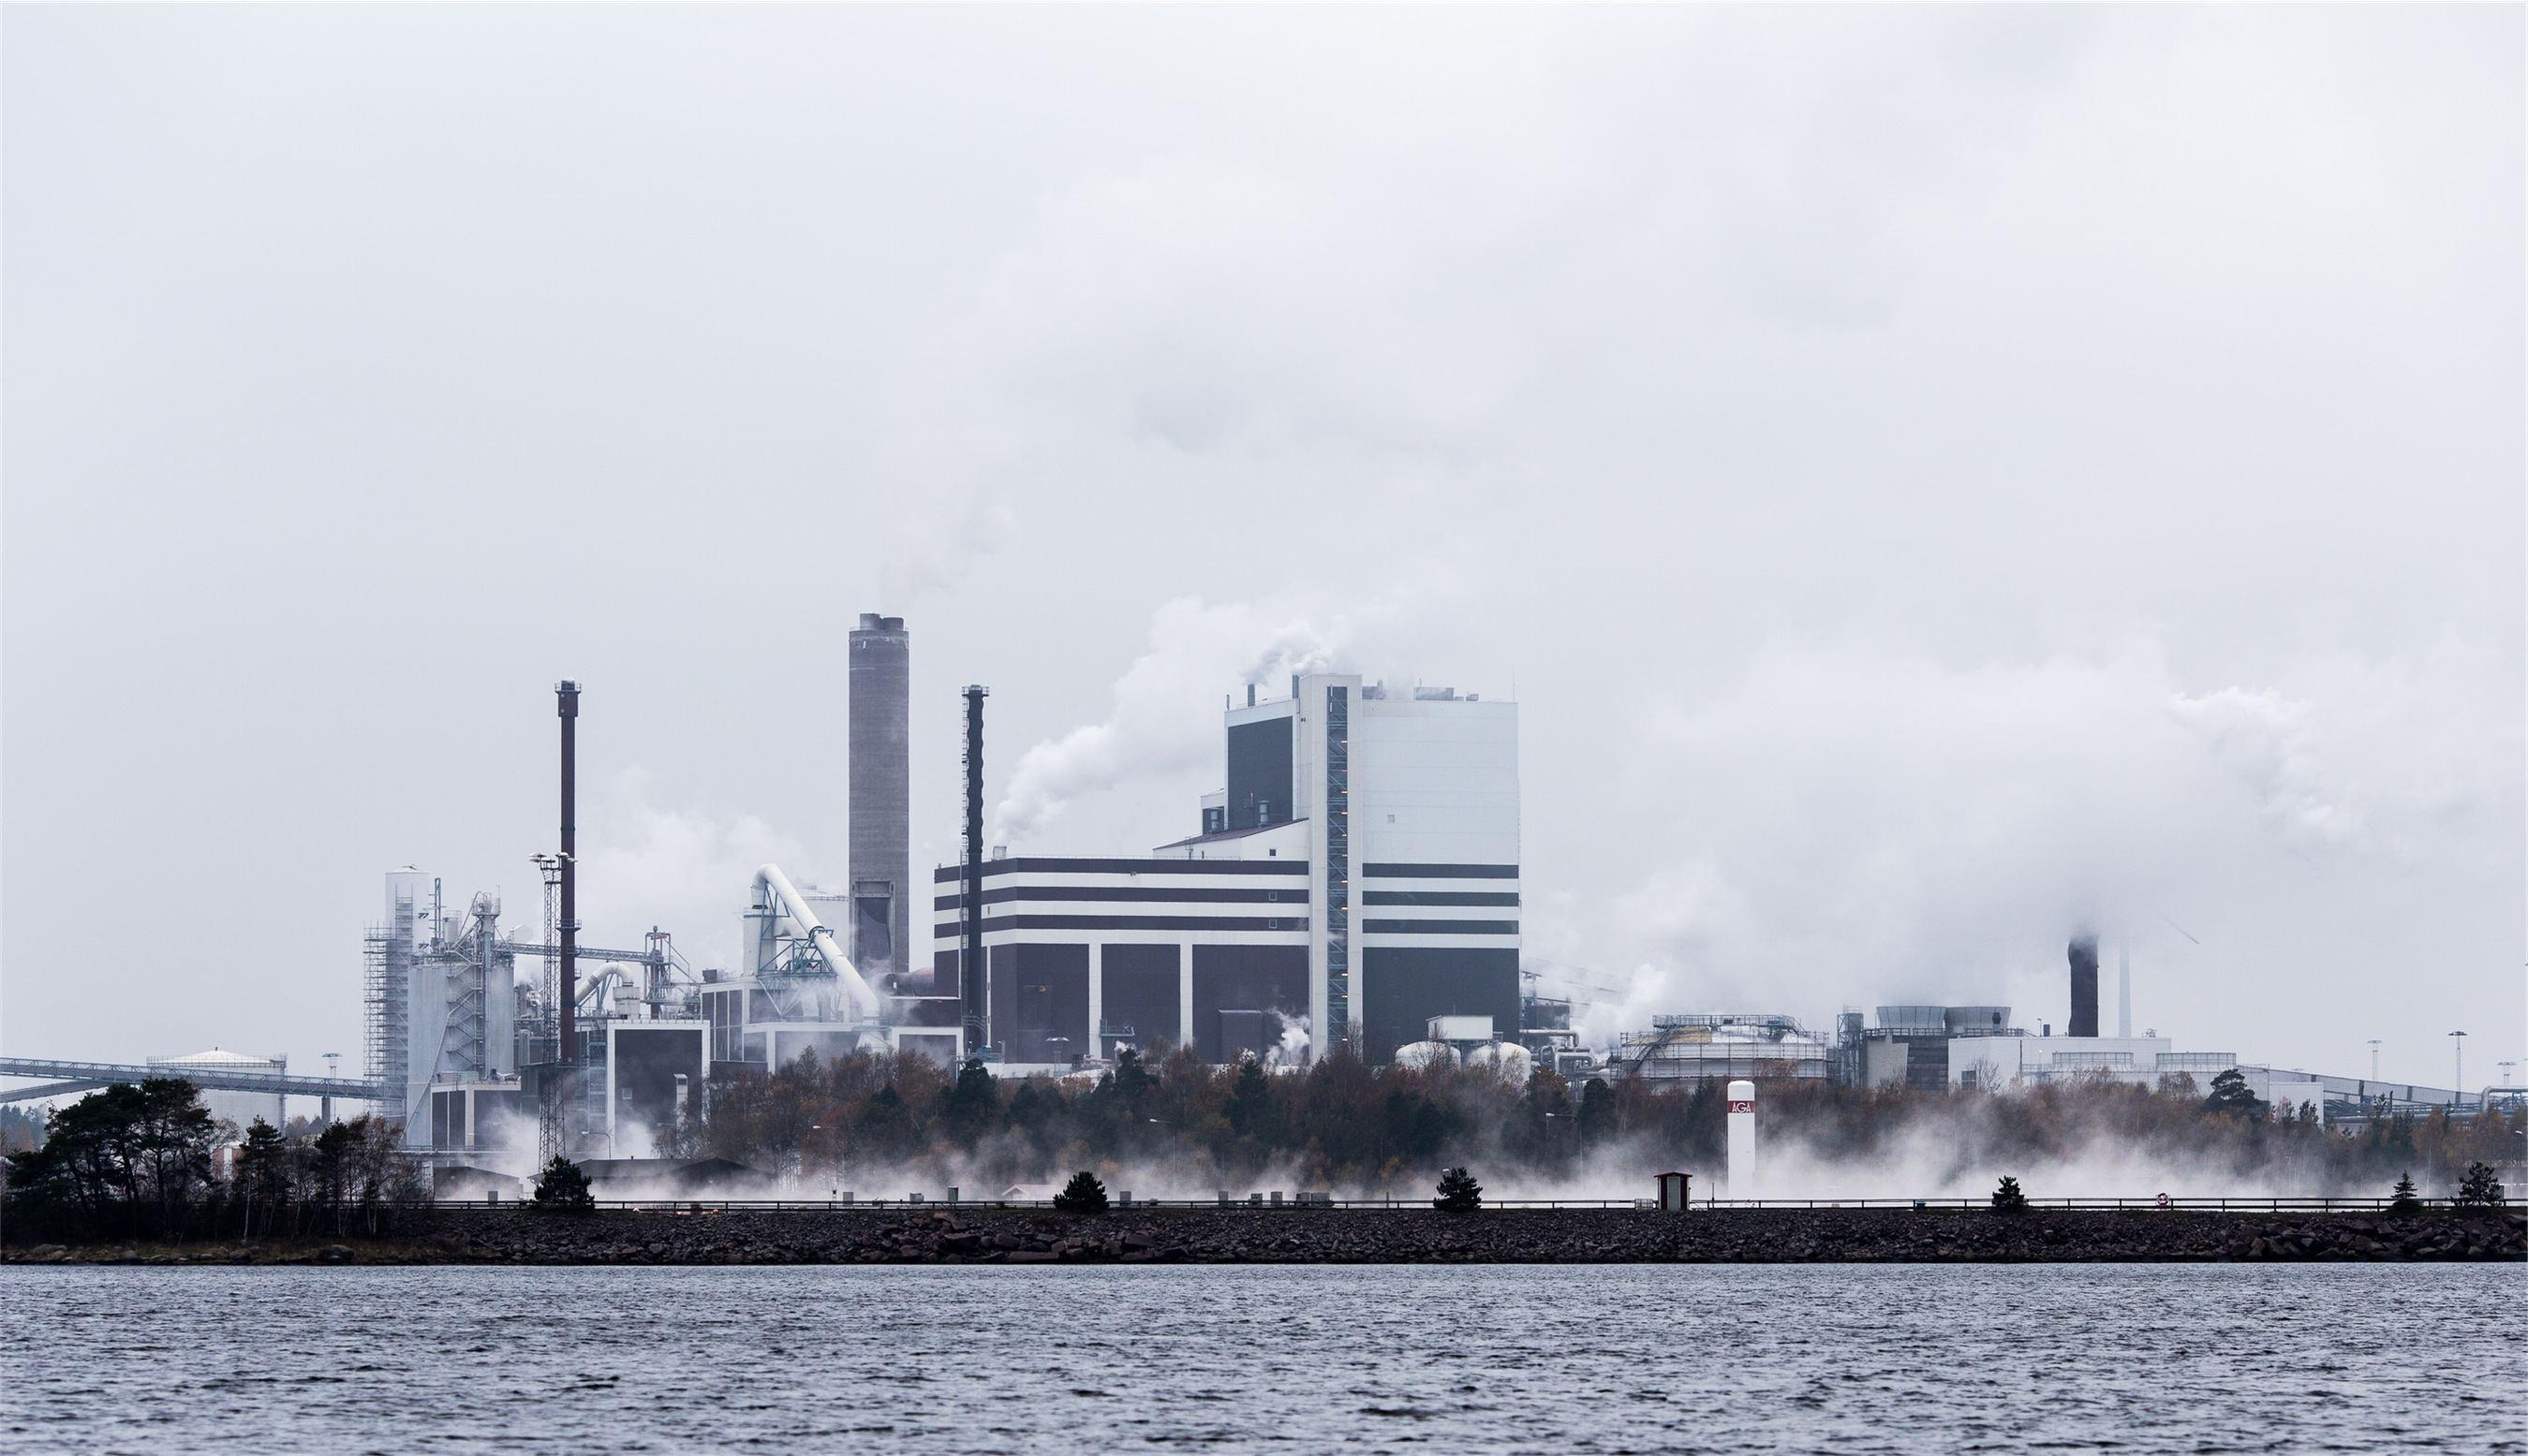 Les combustibles fossiles s'épuisent